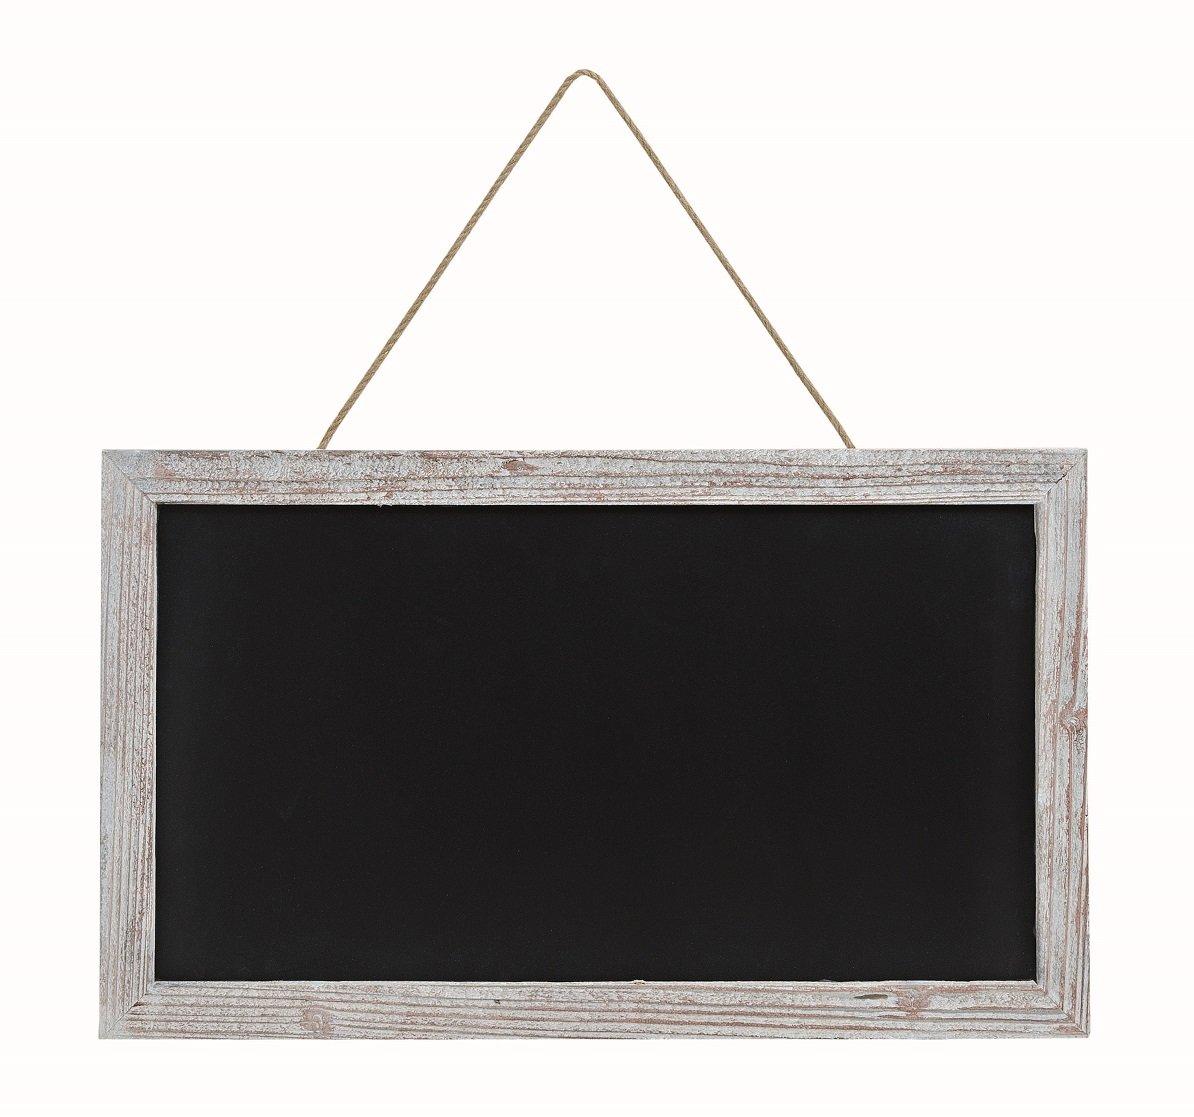 Geschenkestadl Große Kreidetafel Memotafel zur Beschriftung 63 x 38 cm Küchentafel Holzrahmen Tafel zum Hängen Wandtafel Unbekannt